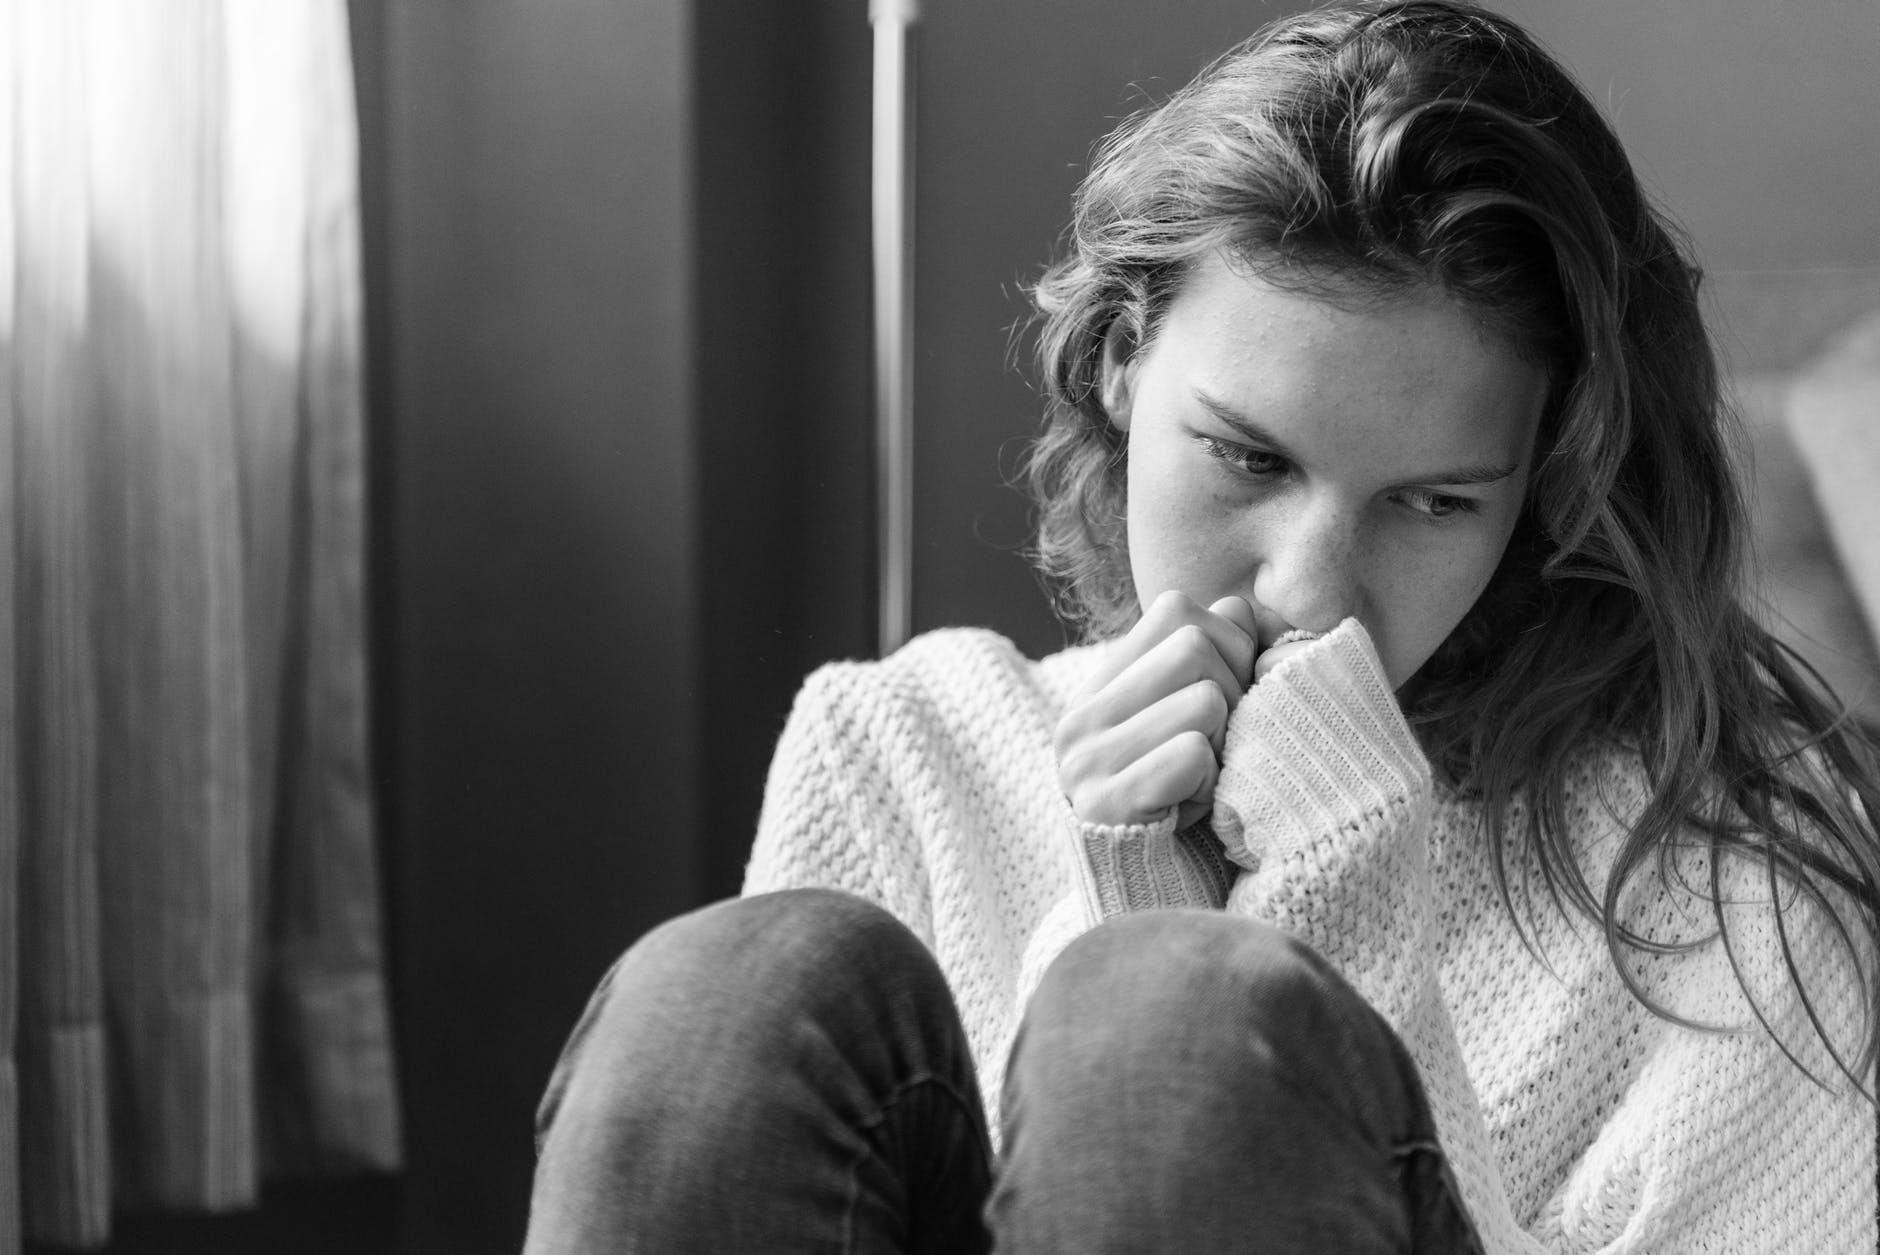 improve low self-esteem by talking to a friend or tutor